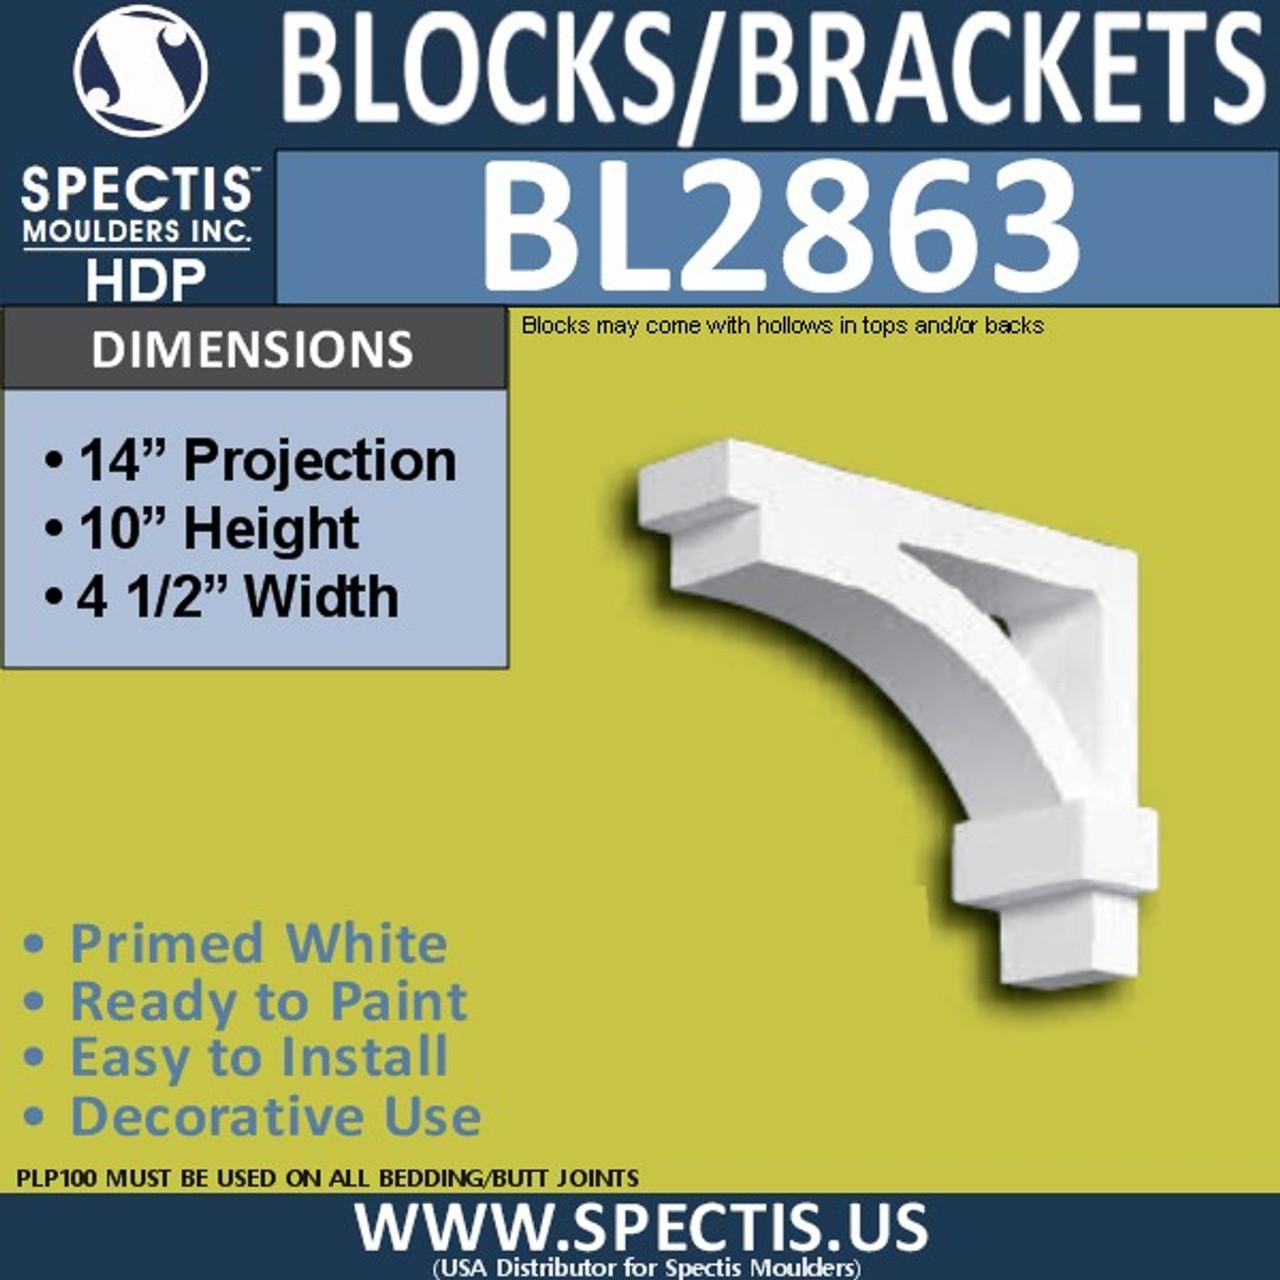 "BL2863 Eave Block or Bracket 4.5""W x 10""H x 14"" P"